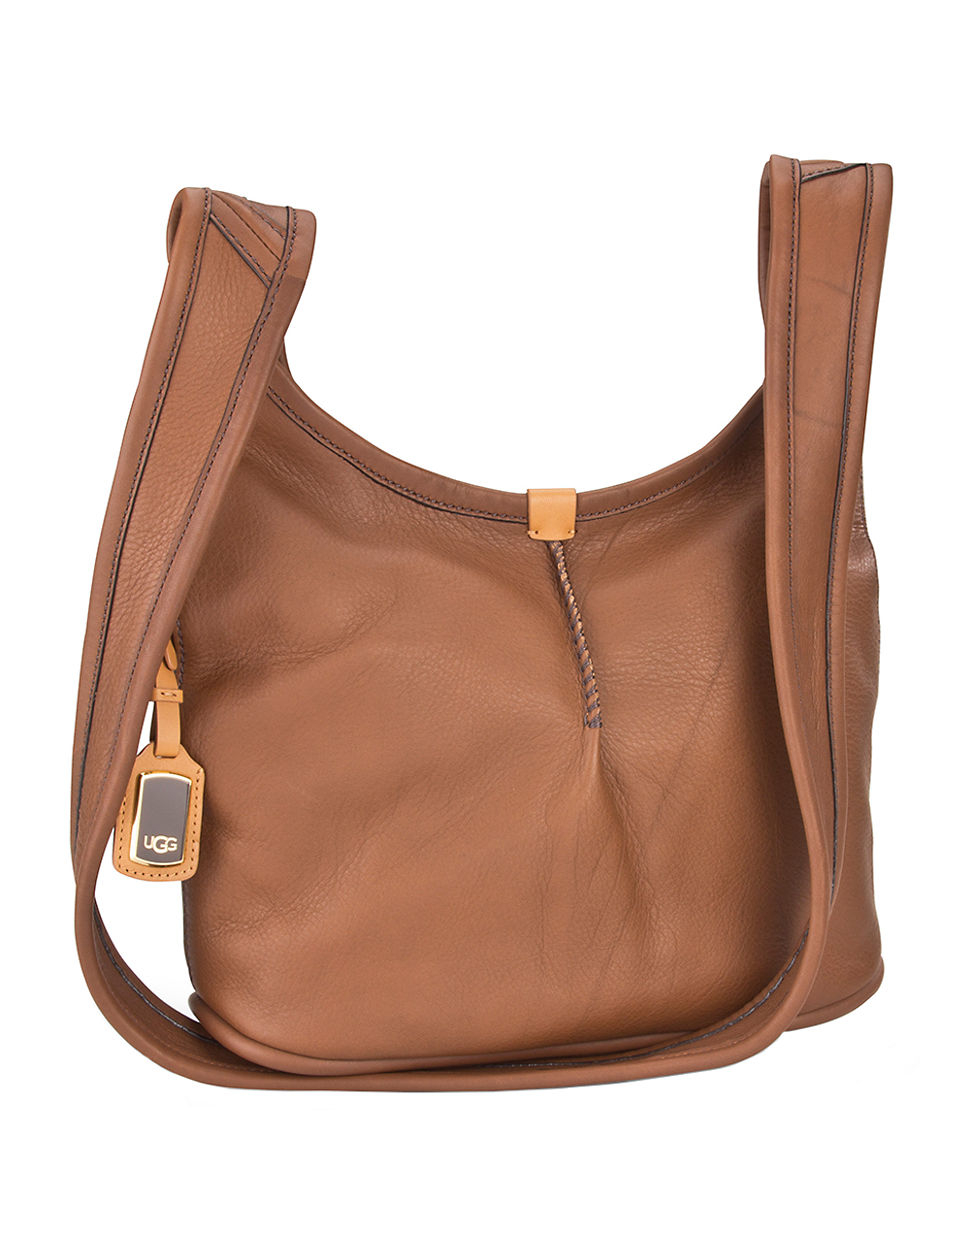 Ugg Carmen Small Crossbody Hobo Bag in Brown | Lyst